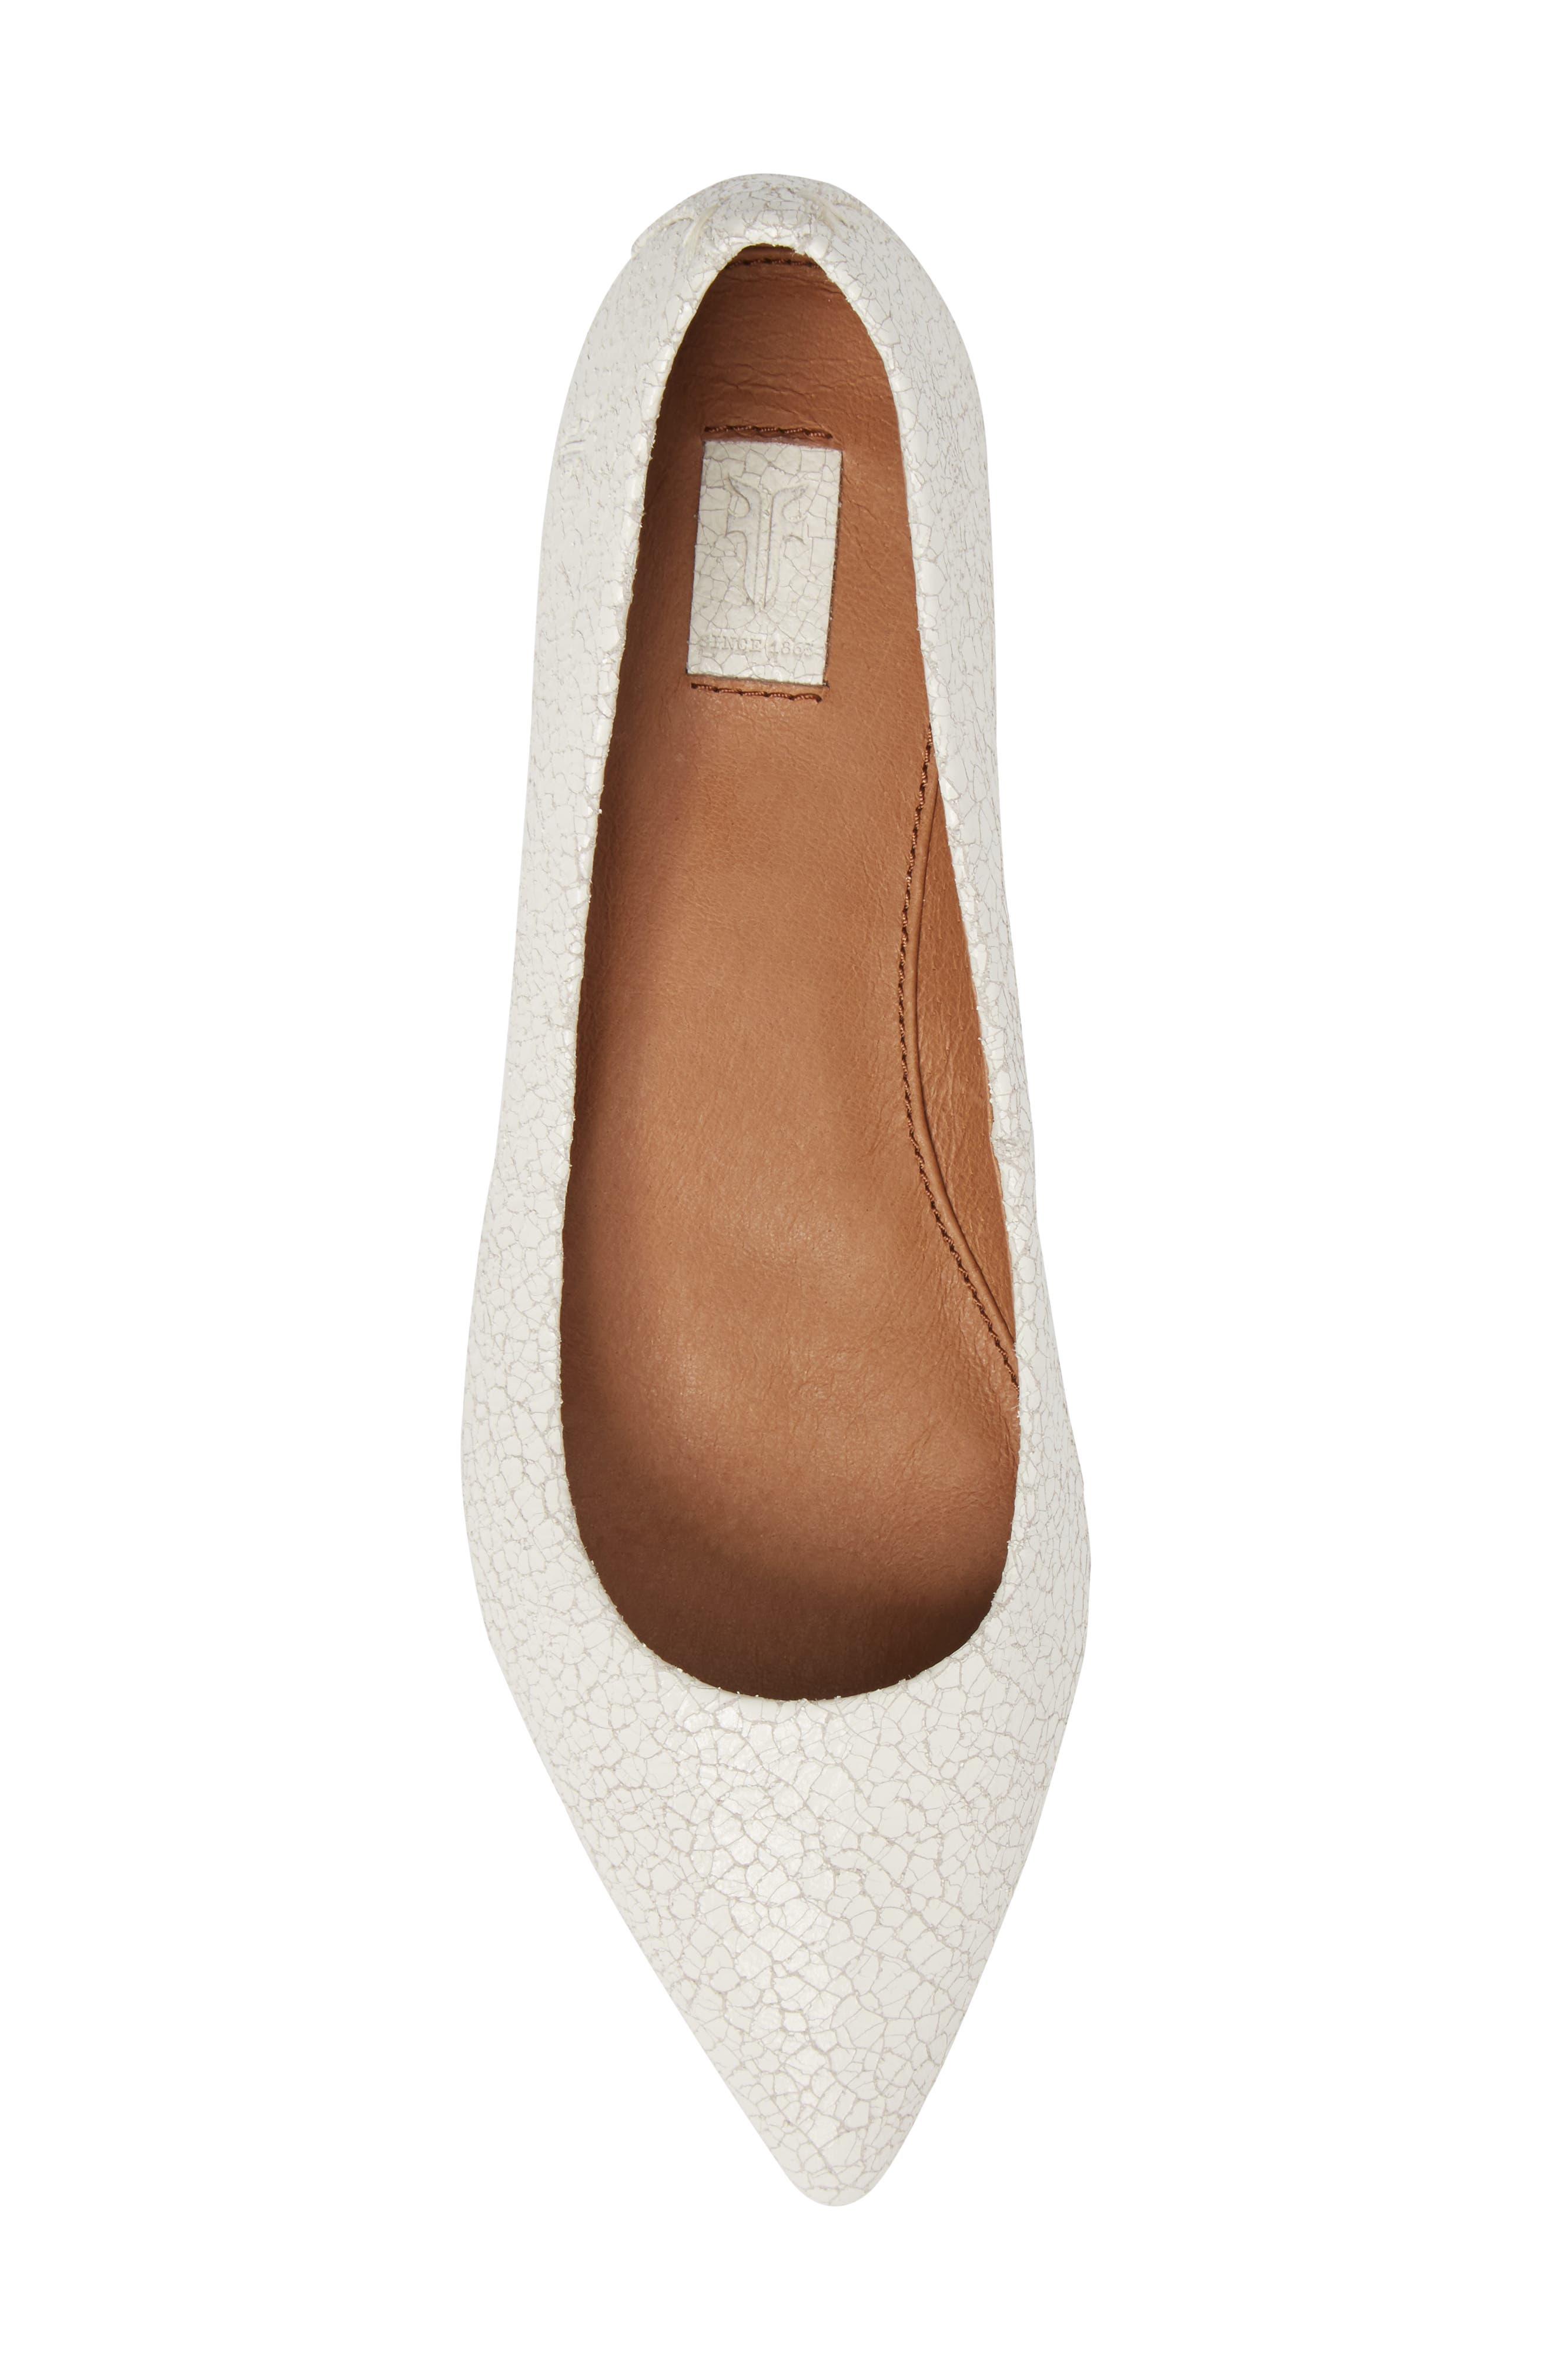 Sienna Pointy Toe Ballet Flat,                             Alternate thumbnail 14, color,